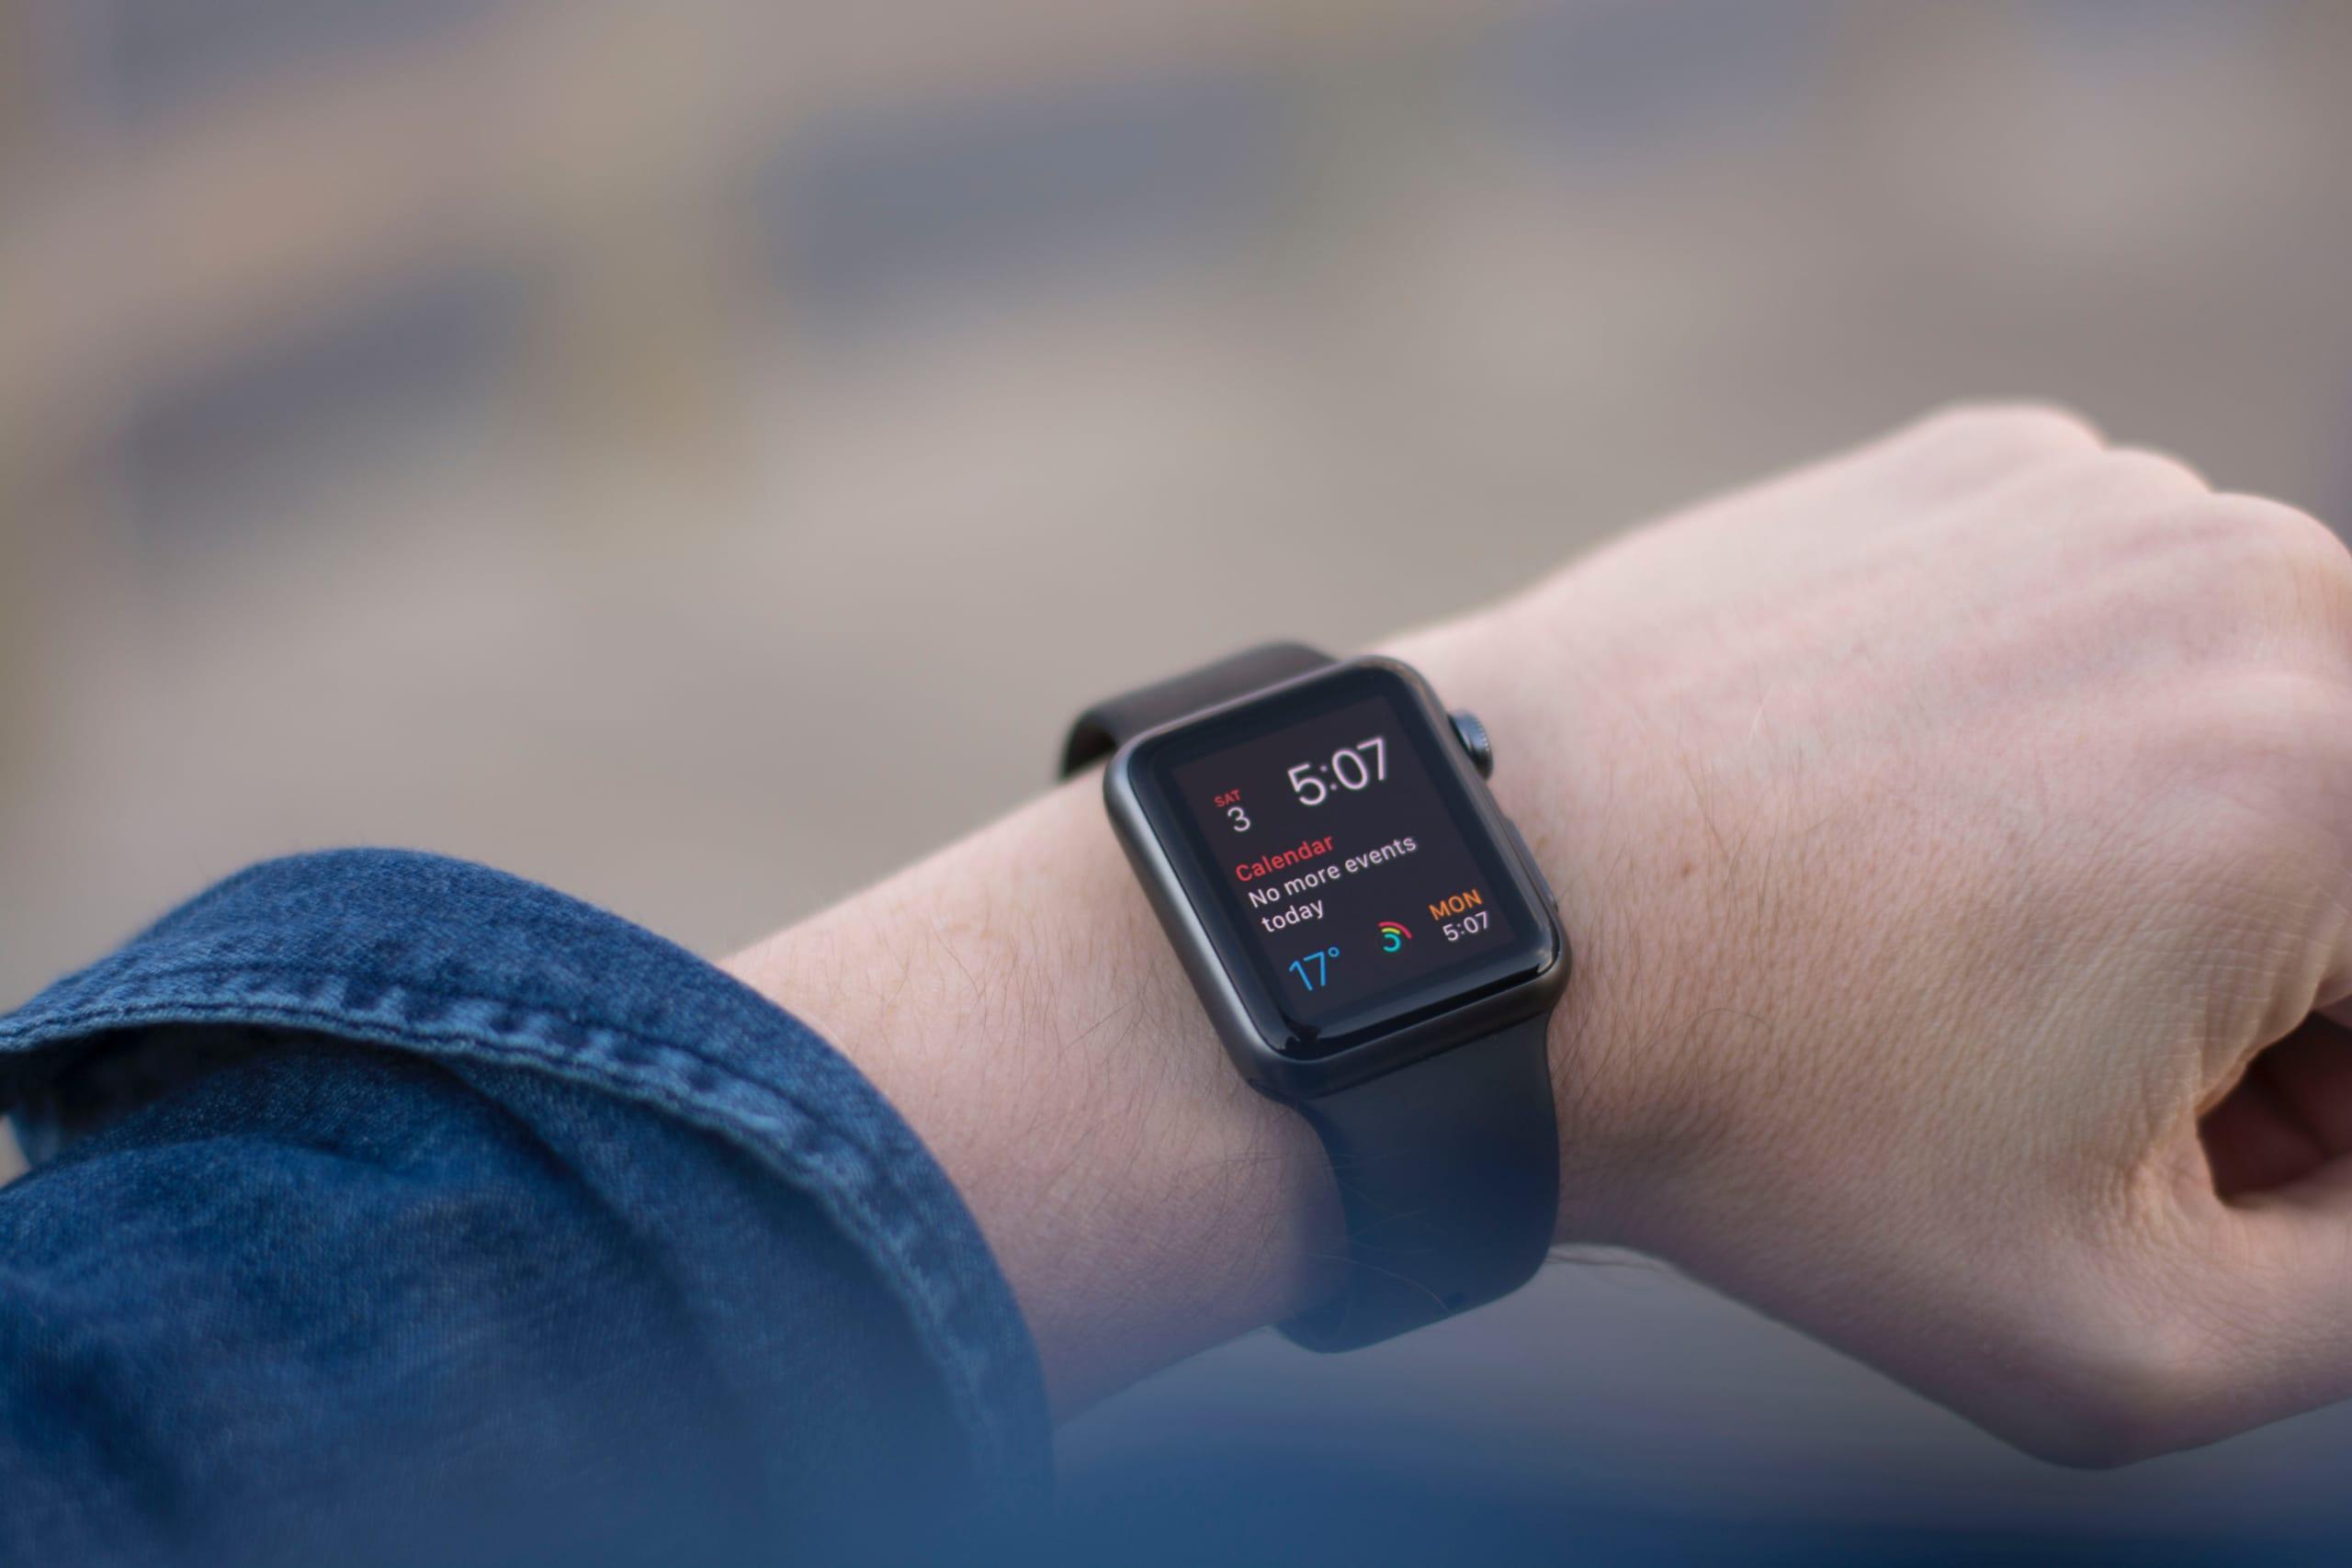 Apple Watchソフトウェア(OS)アップデートできない原因と対処法は?方法や時間も紹介